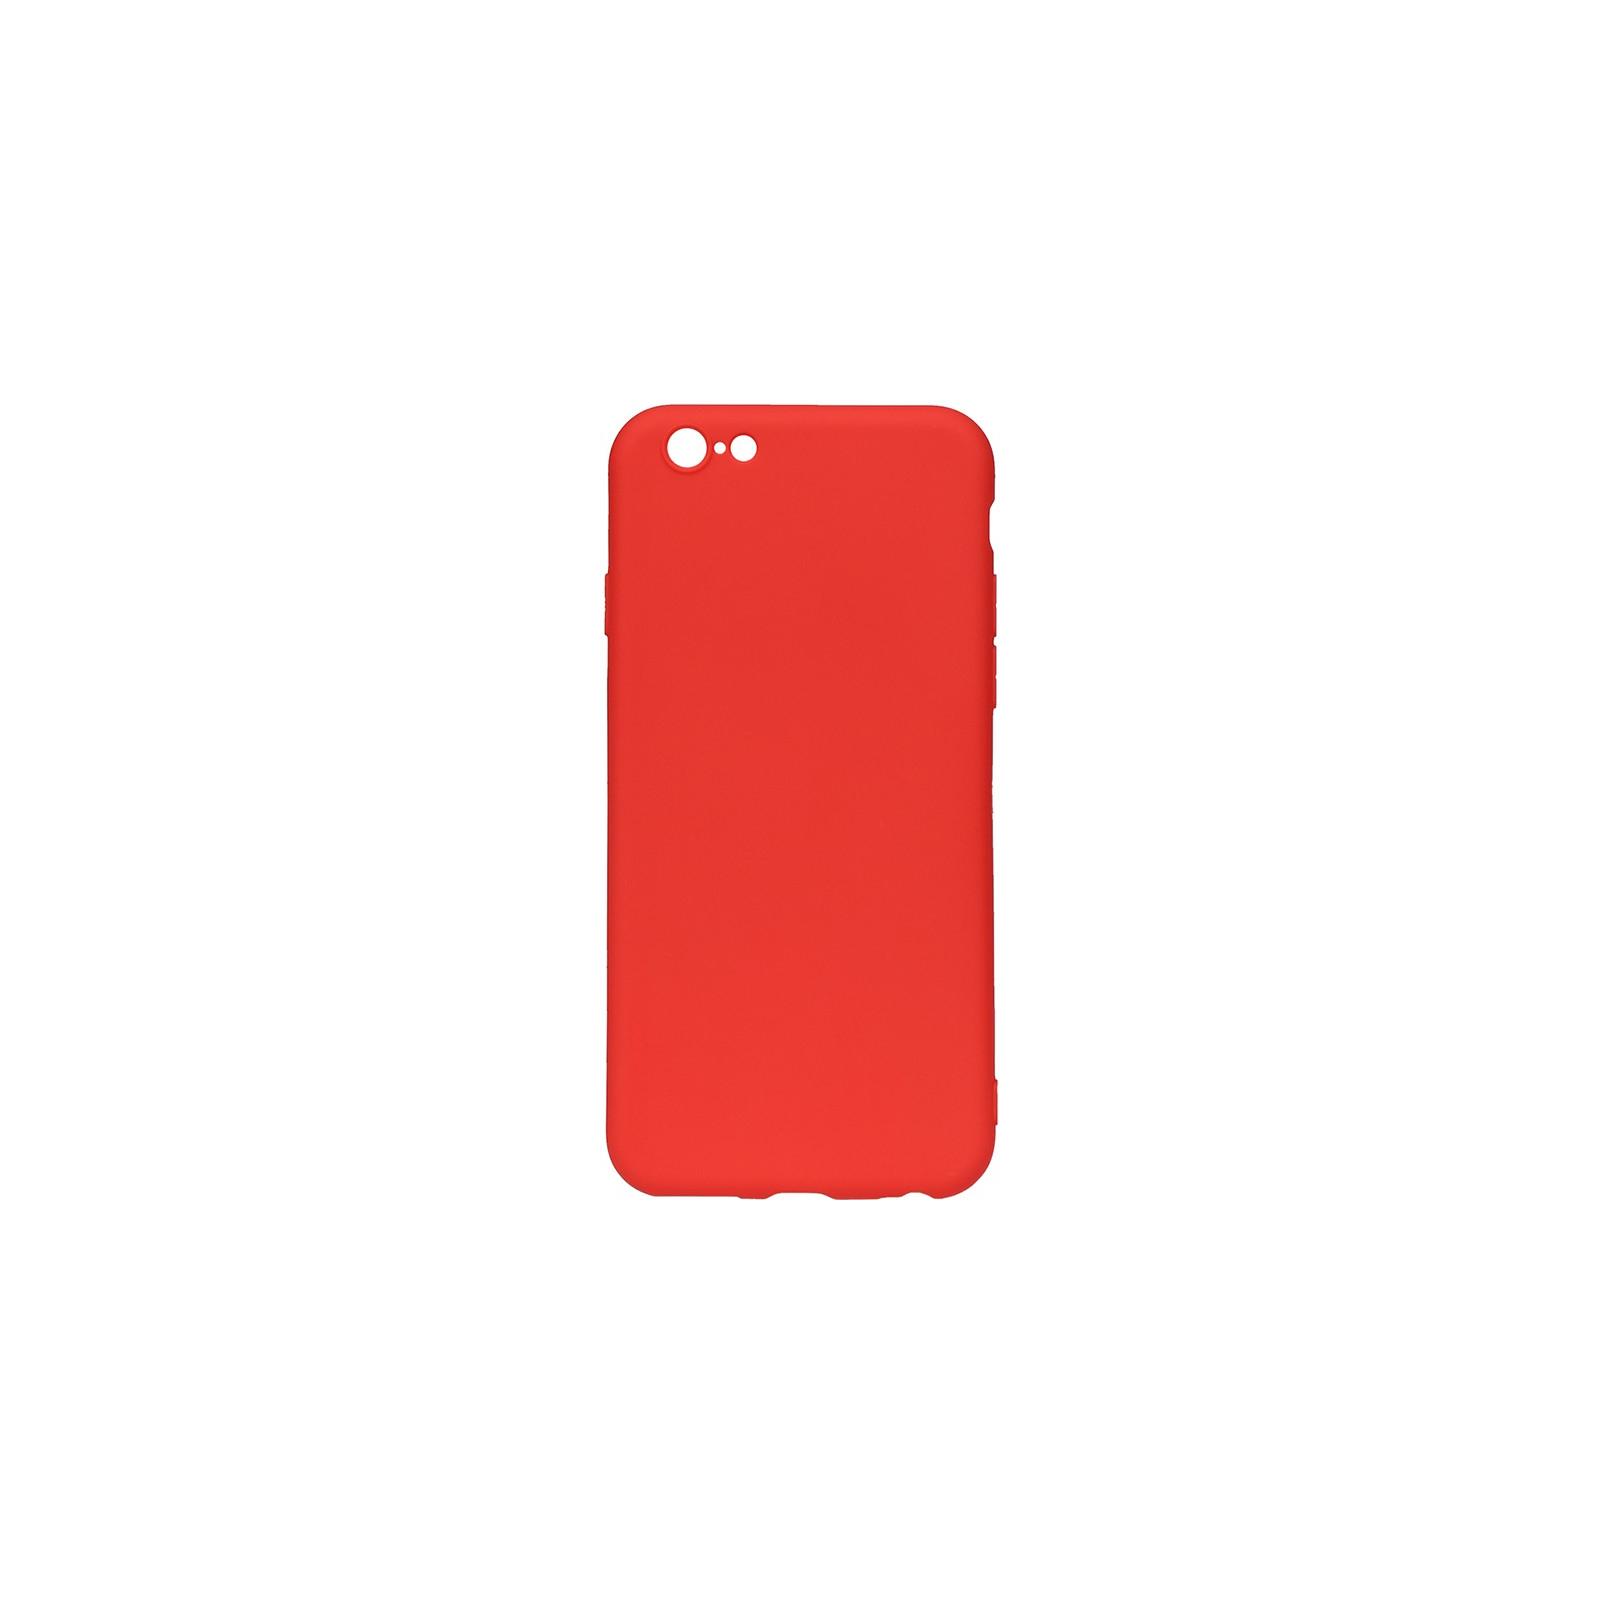 Чехол для моб. телефона Toto 1mm Matt TPU Case Apple iPhone 6/6s Red (F_94013)